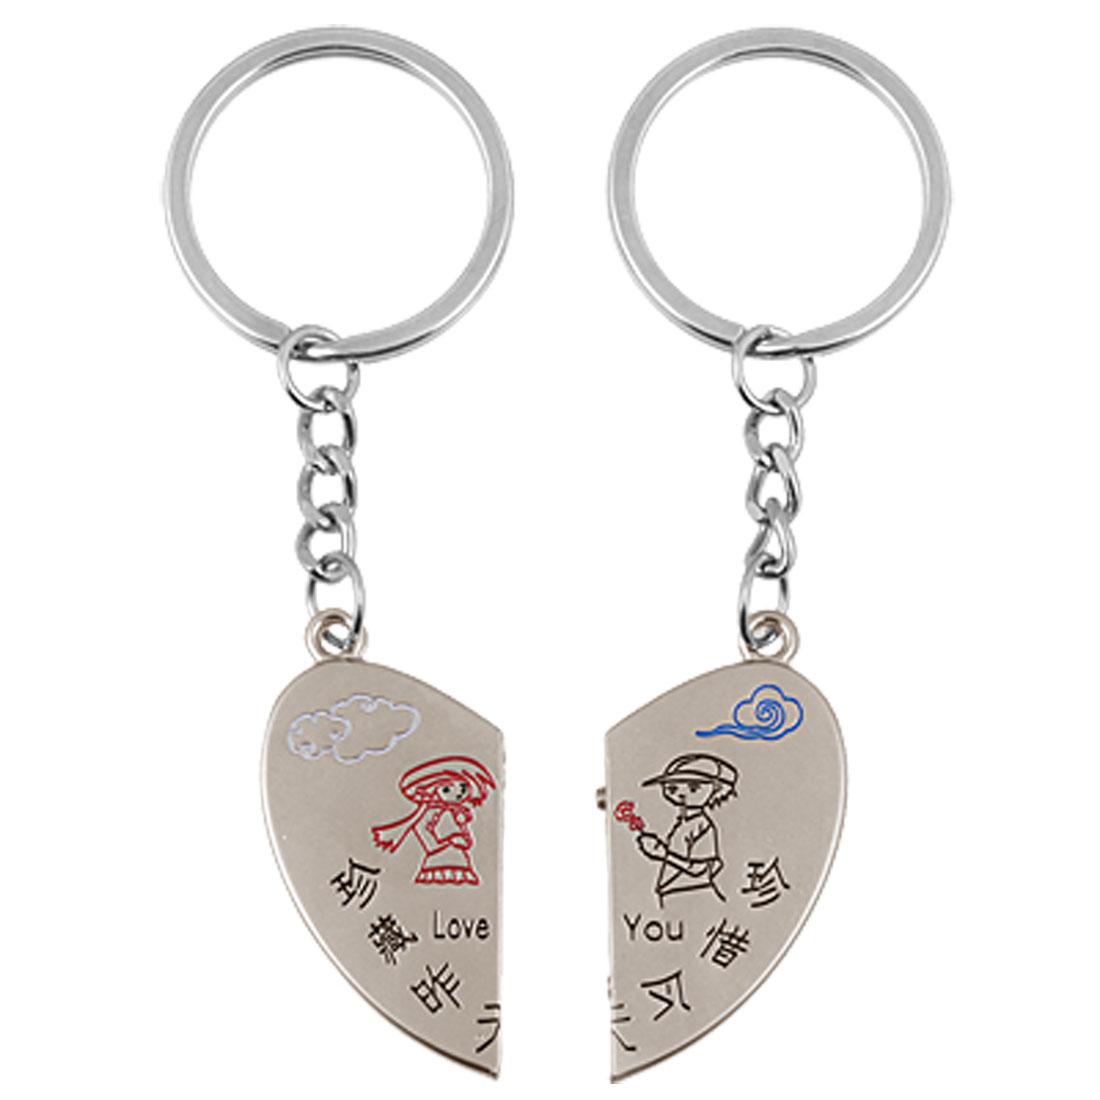 2 Pcs Couple Chinese Words Print Keyring Key Ring